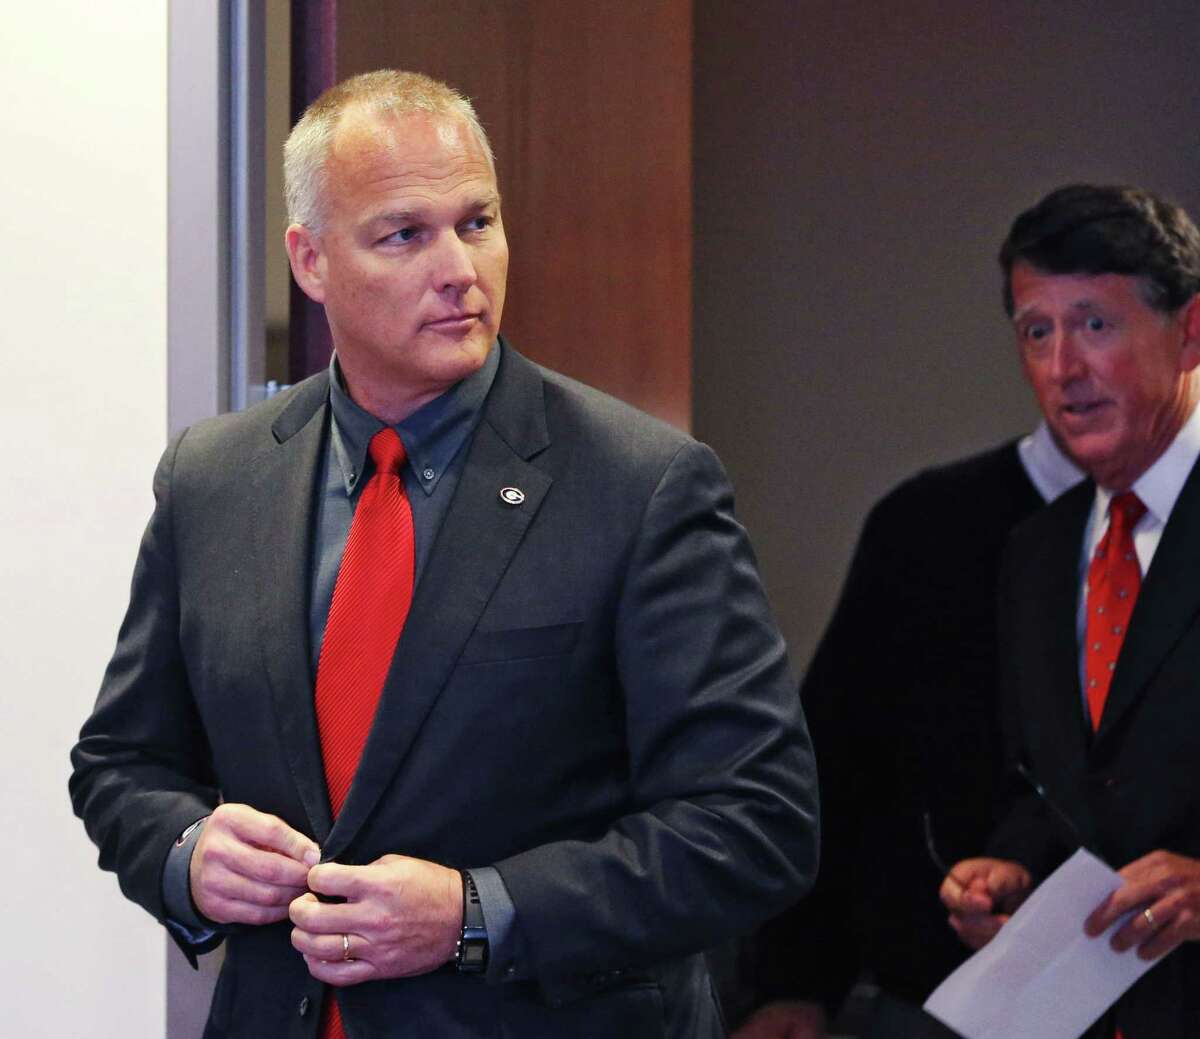 Former Georgia football coach Mark Richt will be named coach at Florida.